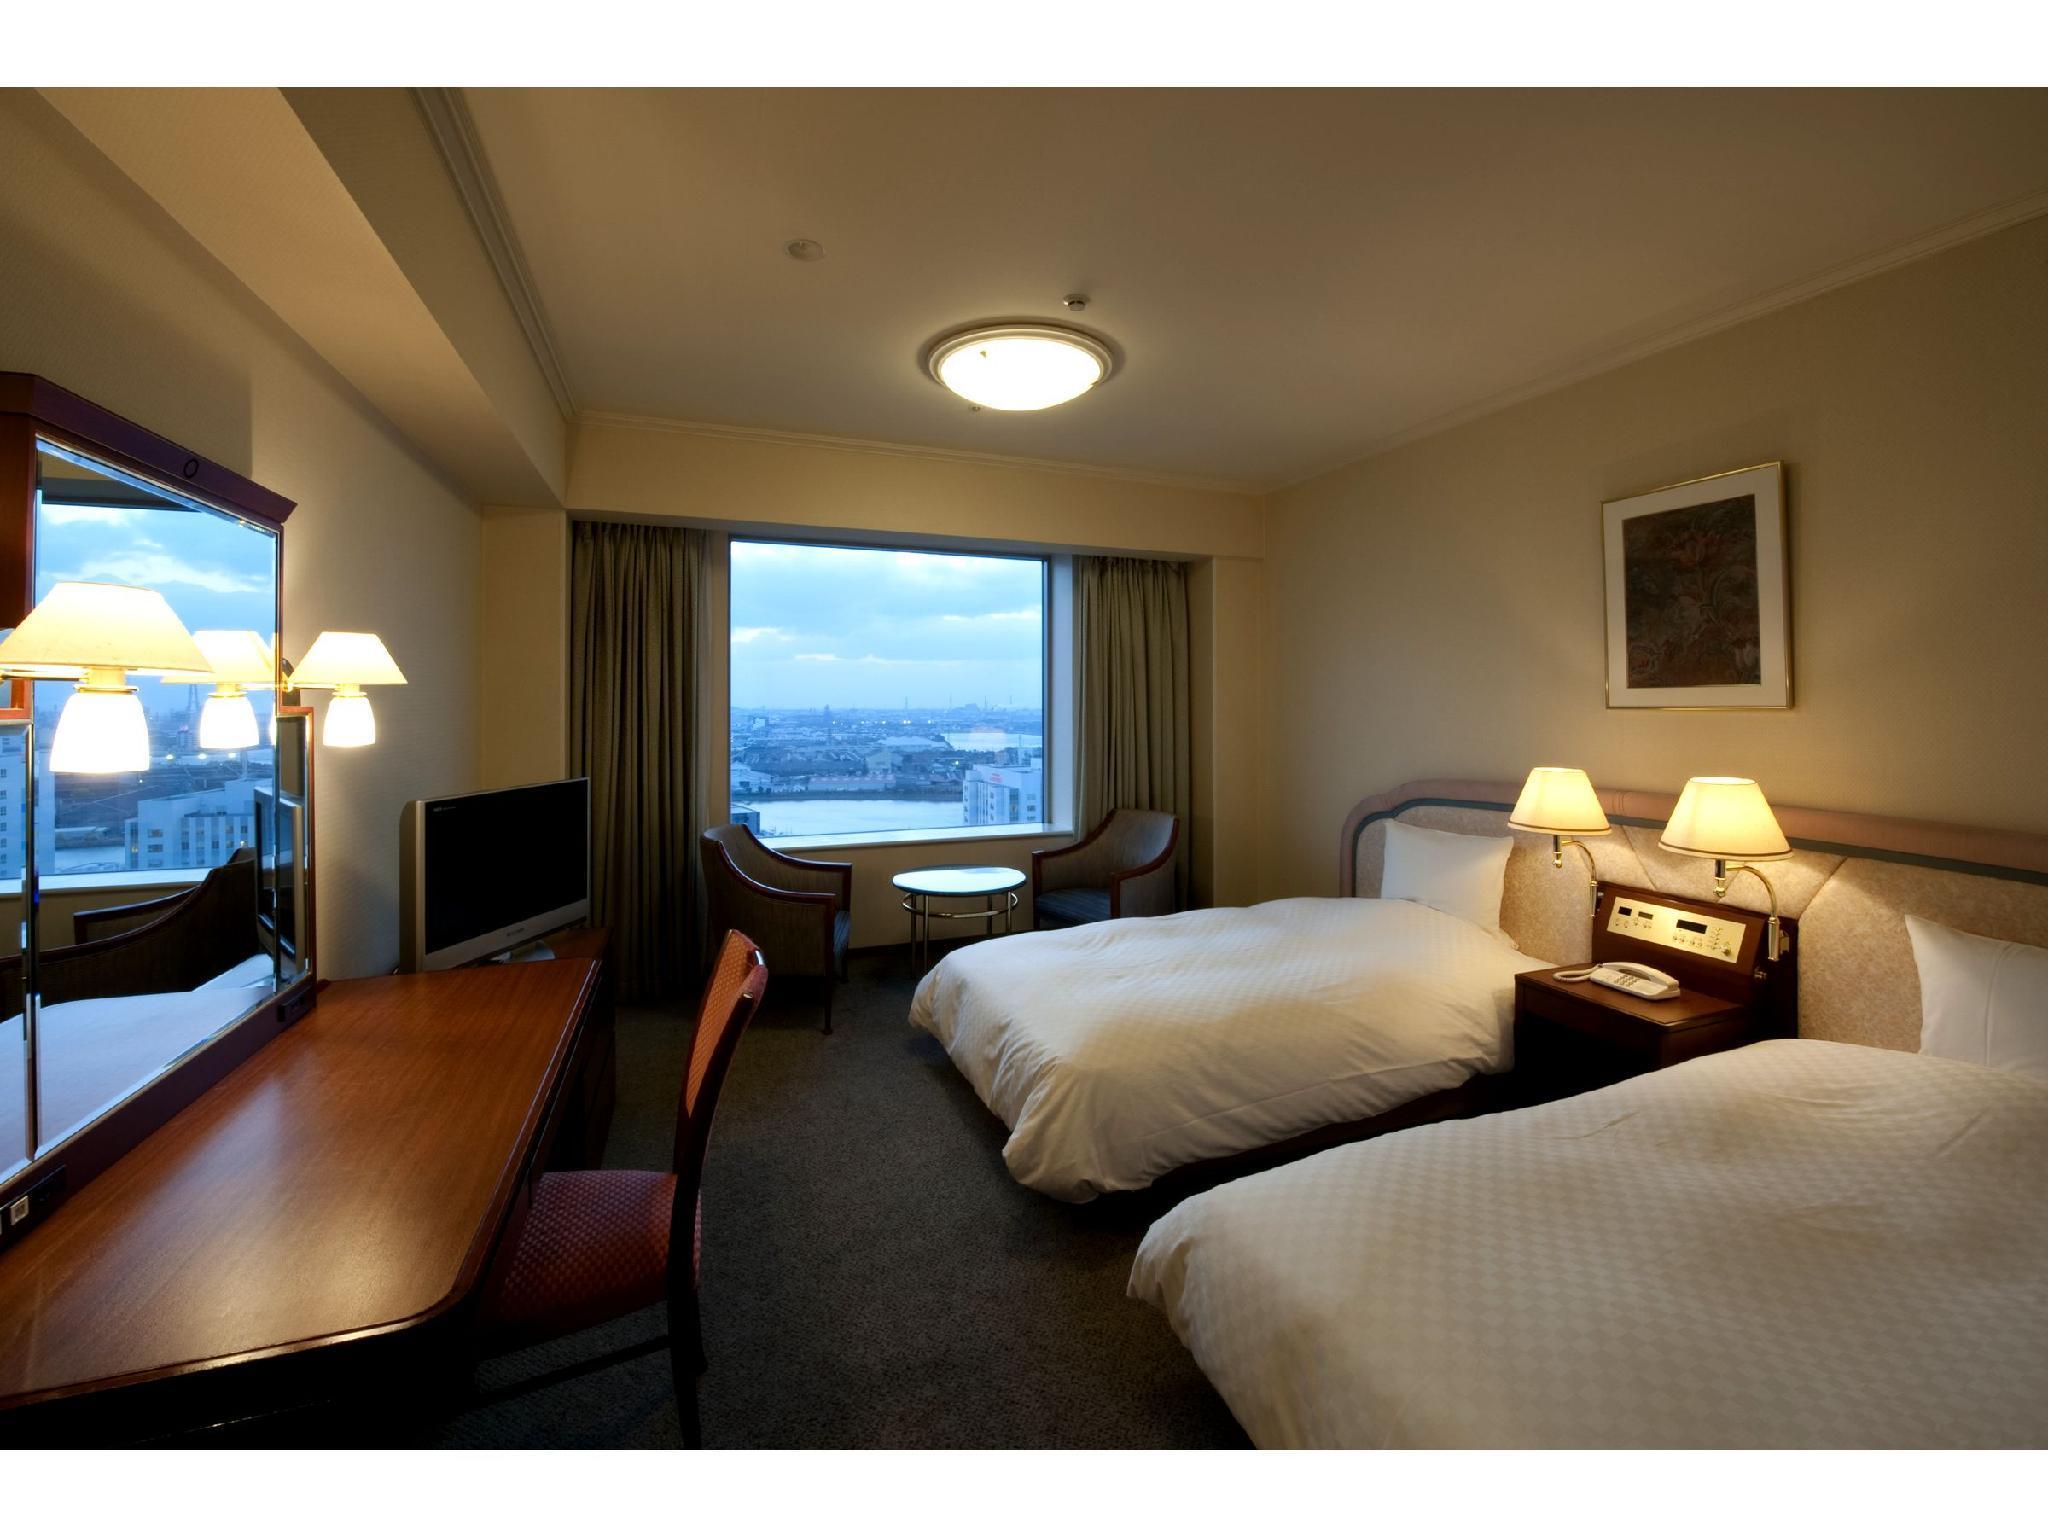 Rihga Royal Hotel Kokura Fukuoka, Kitakyūshū